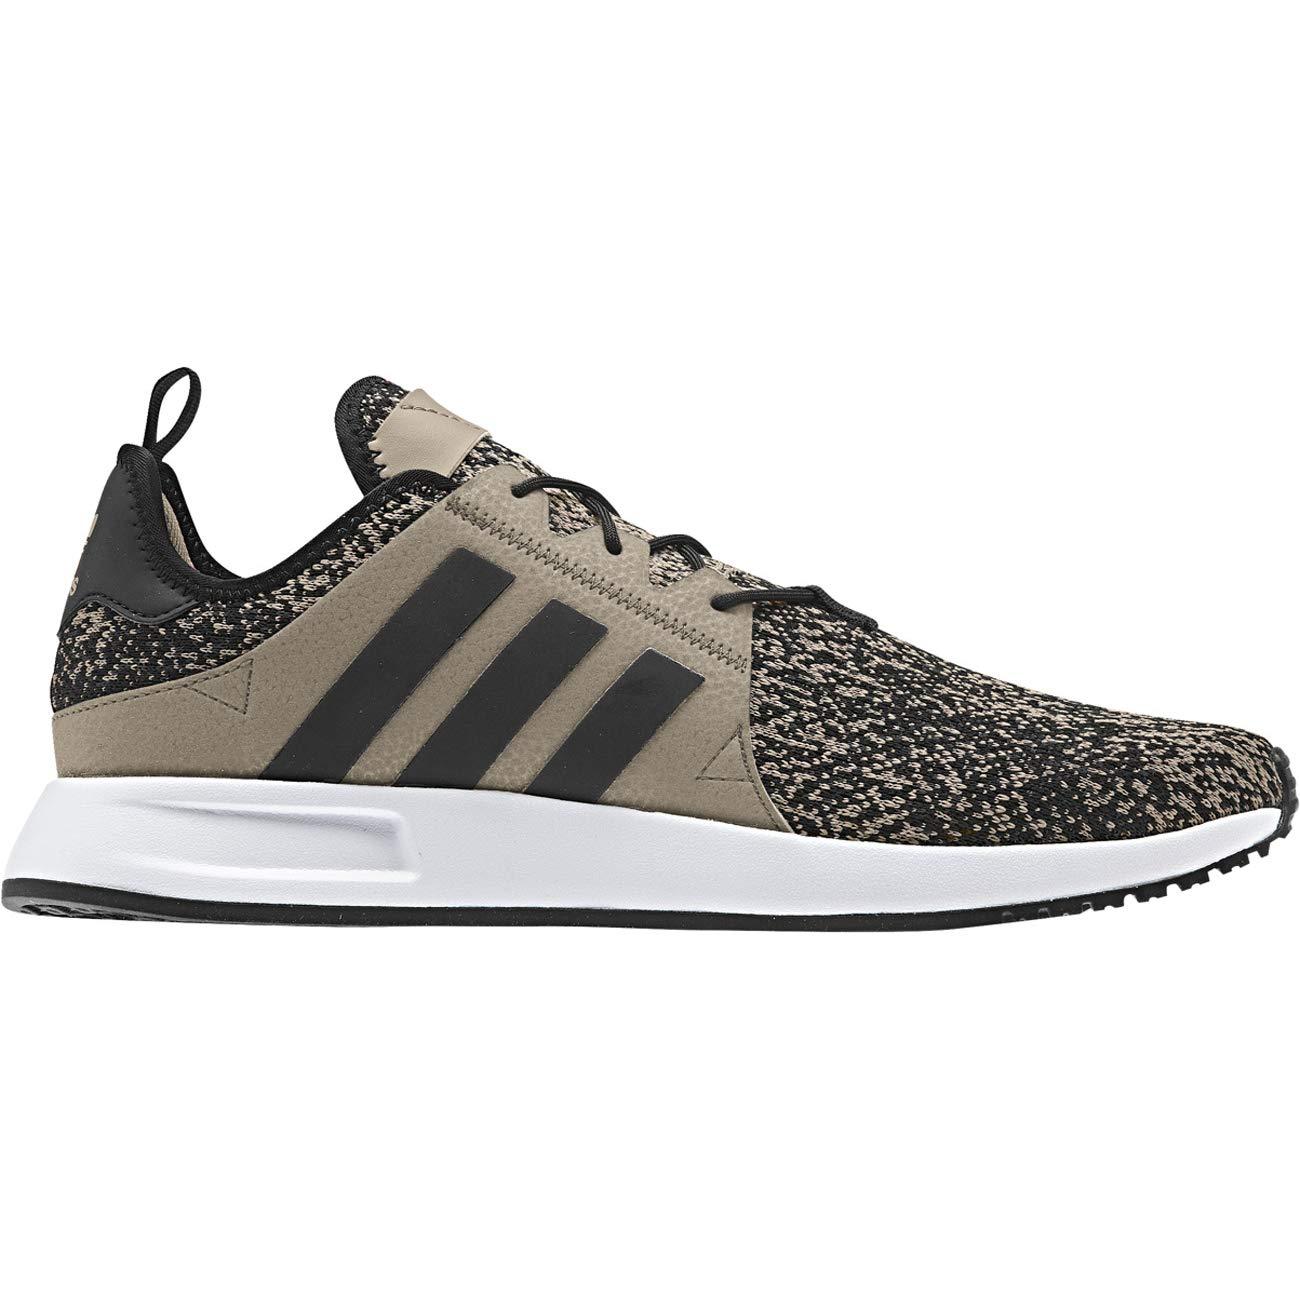 Adidas Originals Turnschuhe X_PLR B37930 B37930 B37930 Beige Grau e6cdc6